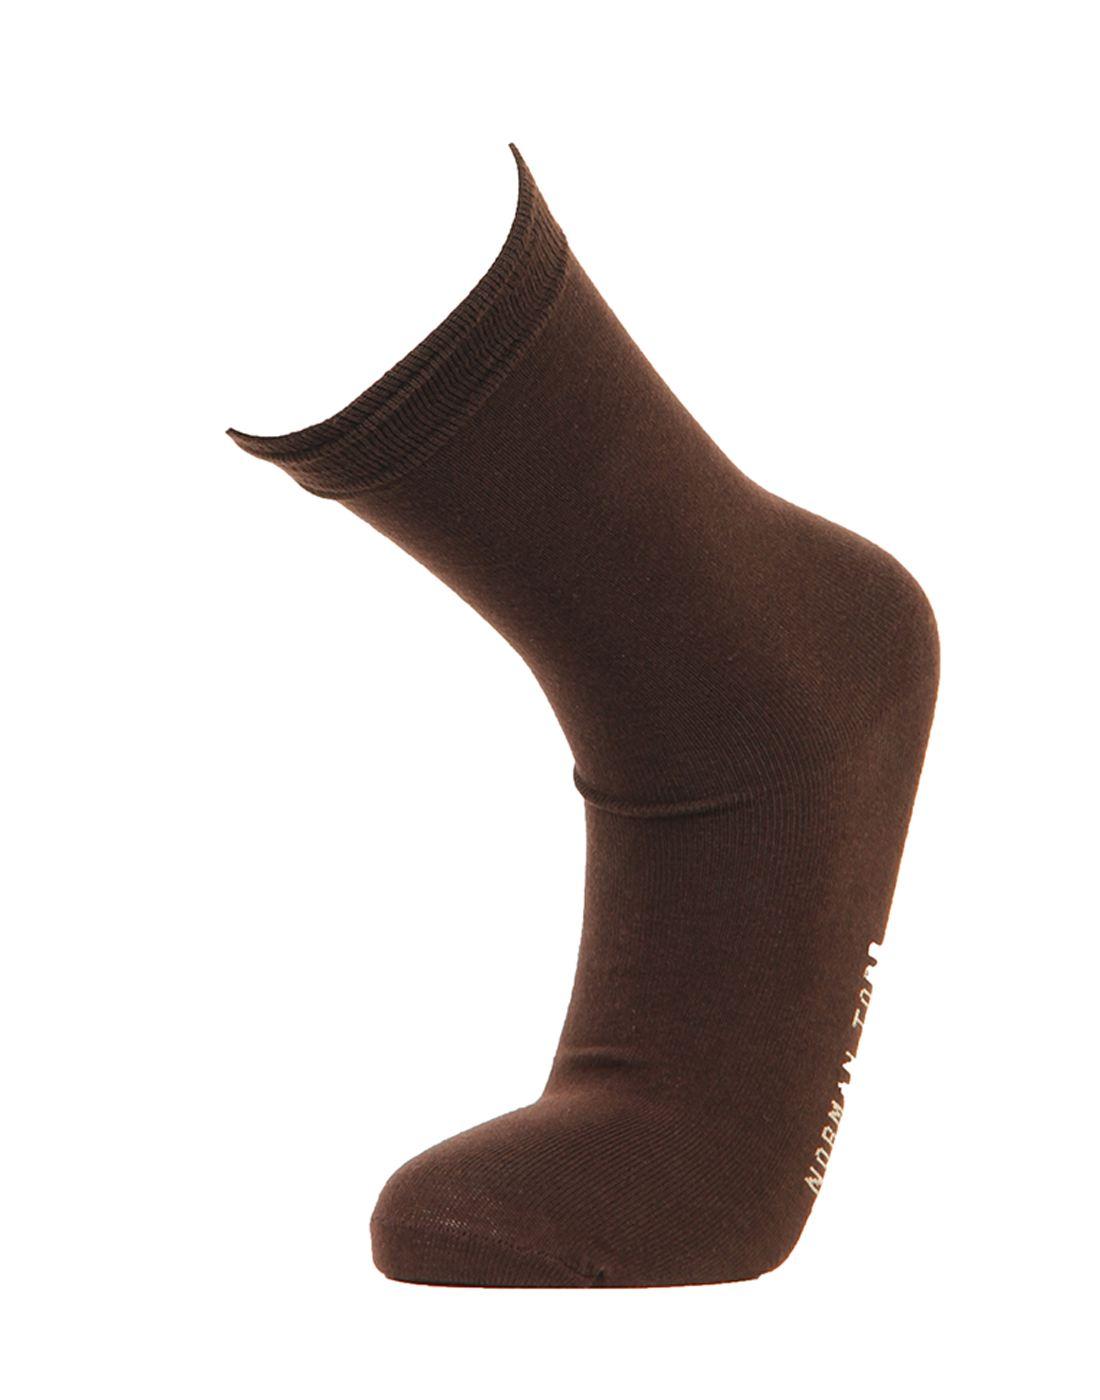 Norman Todd Women Brown Mid-calf Length Socks